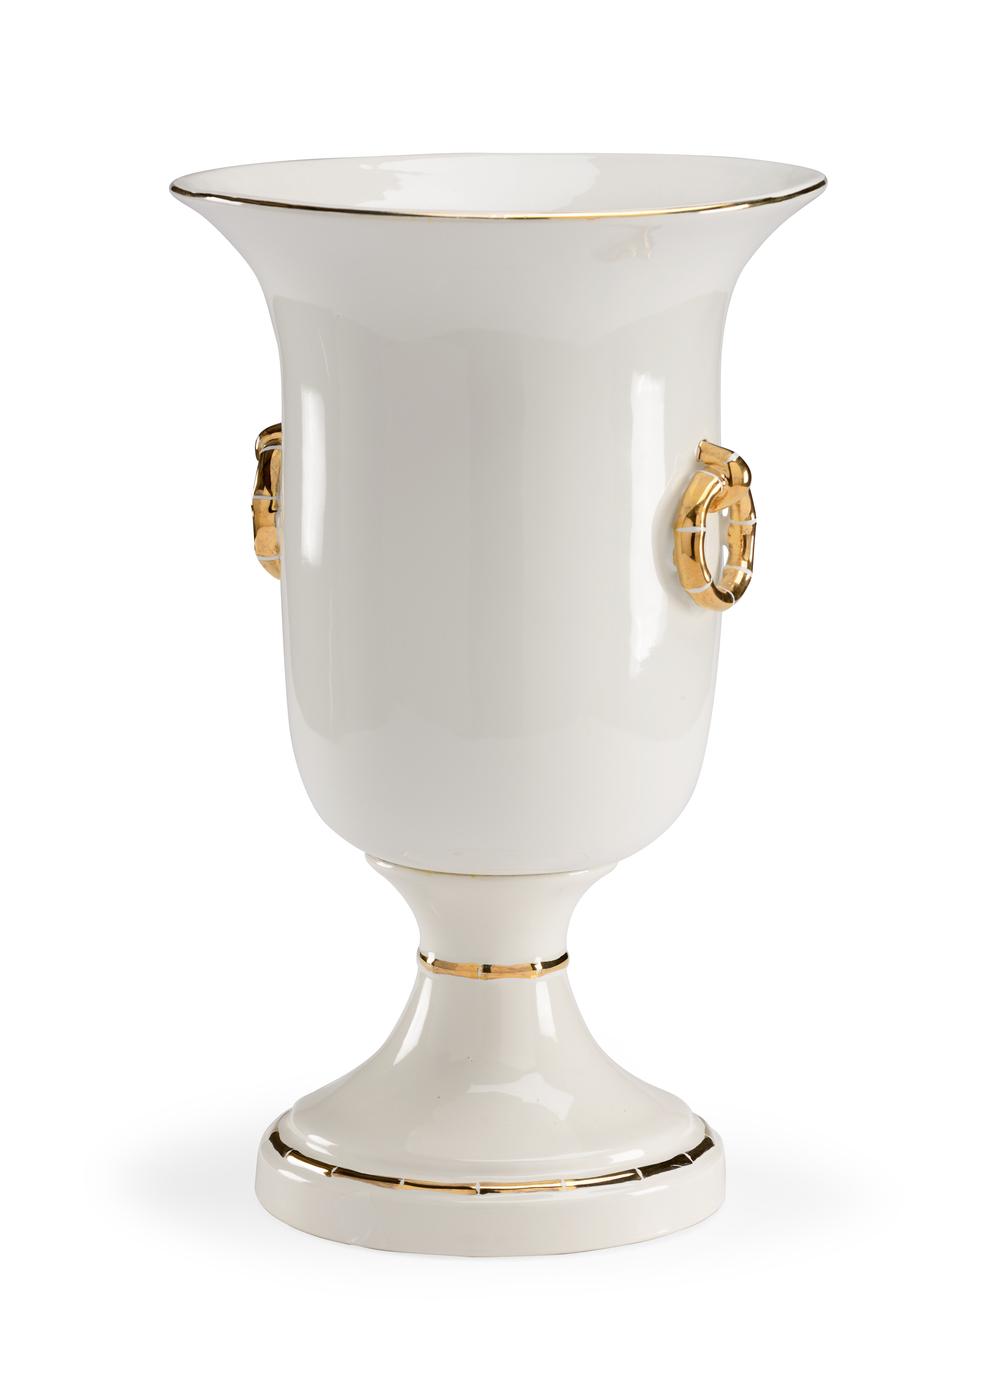 Chelsea House - Ring Vase in Gold